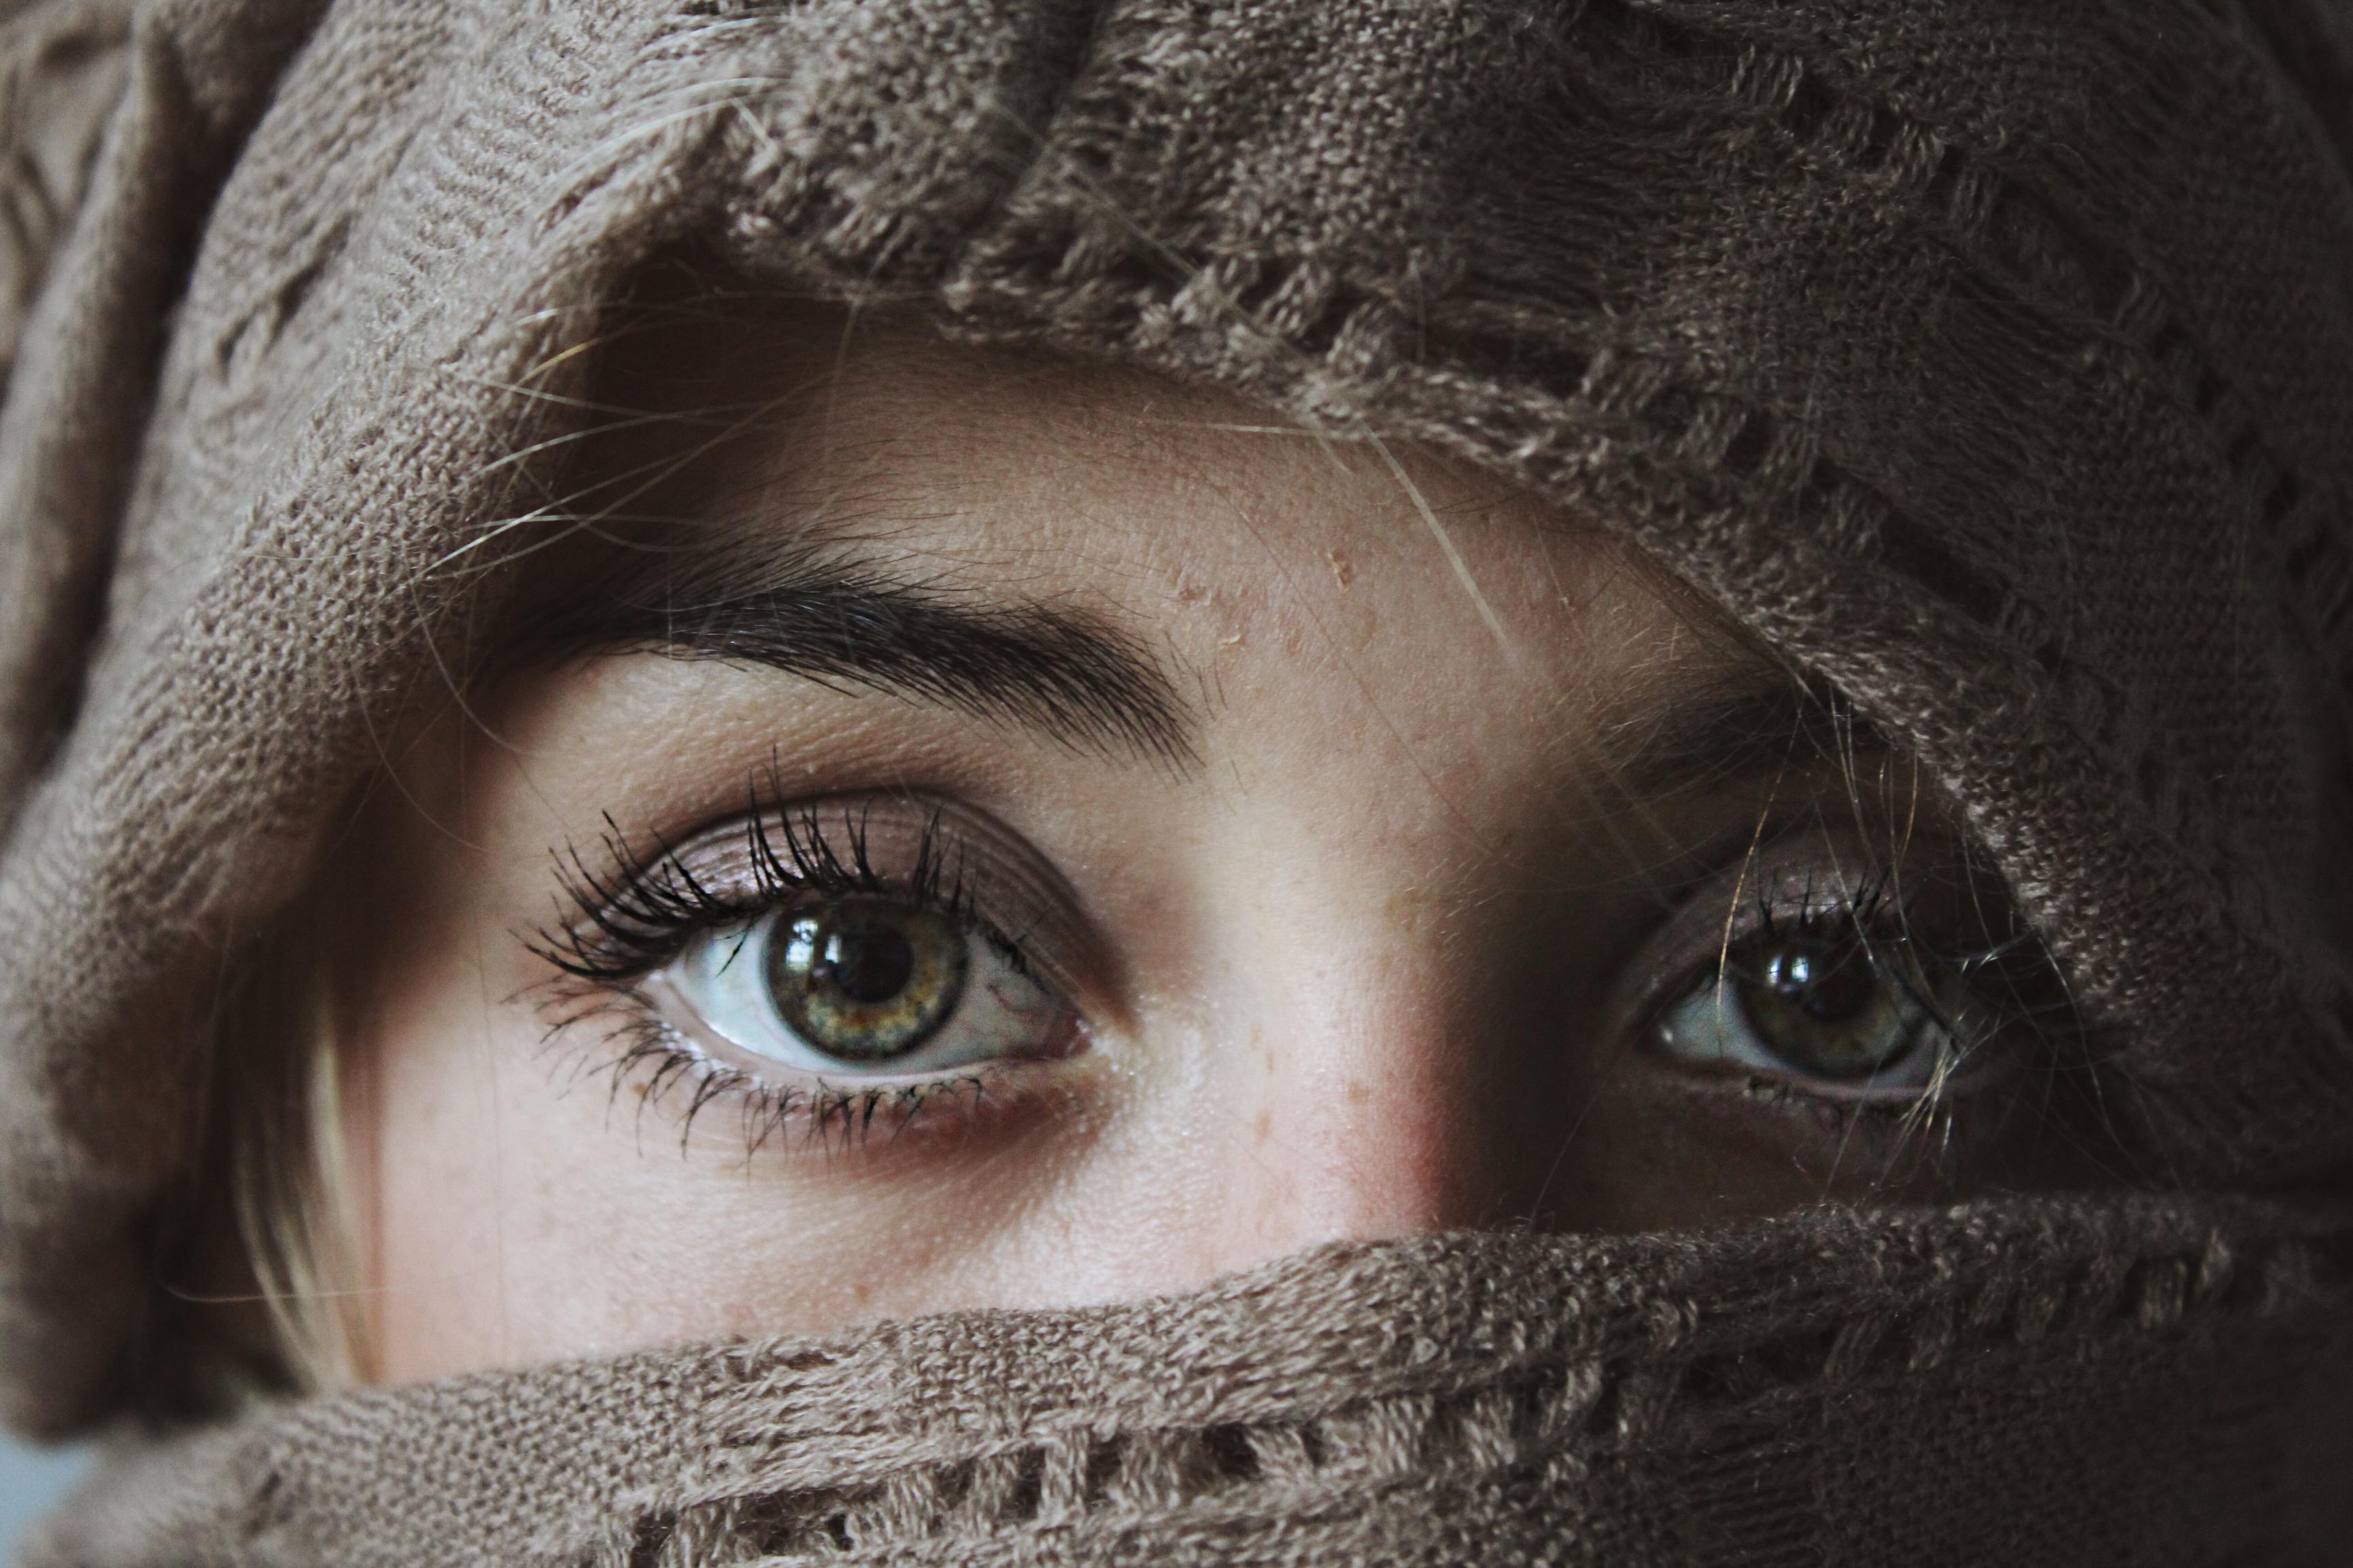 Girl Glasses Wallpaper 1000 Engaging Eyes Photos 183 Pexels 183 Free Stock Photos